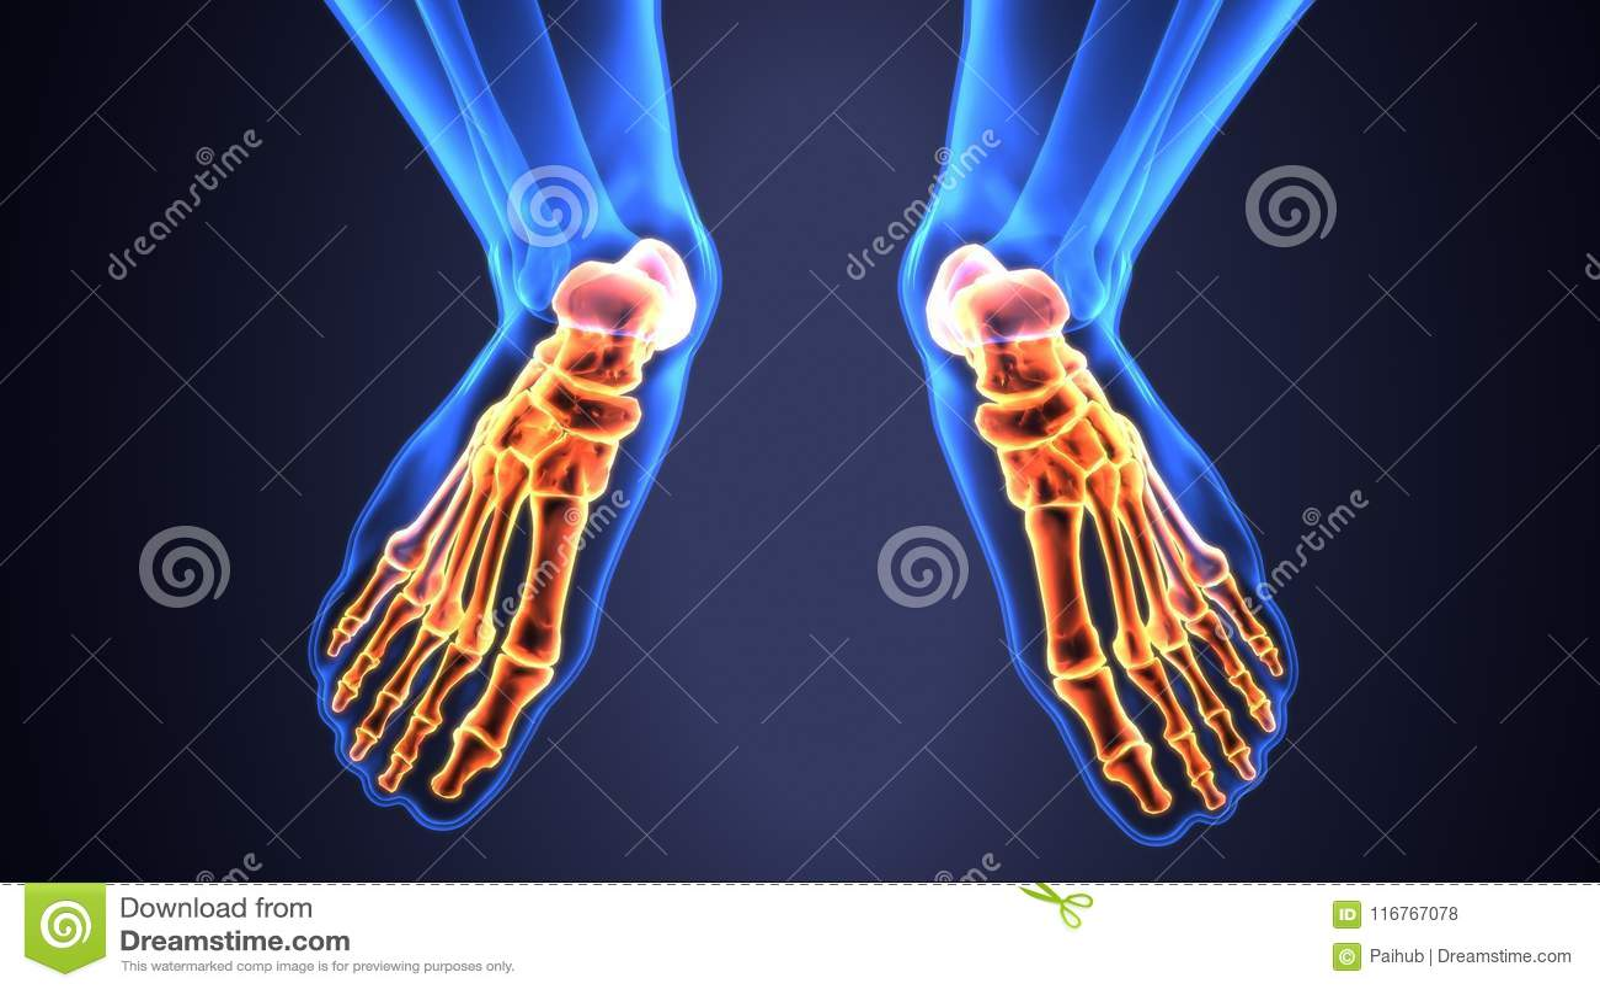 Foot Bones Anatomy Cheap Bones In The Foot Diagram Left Foot Bone